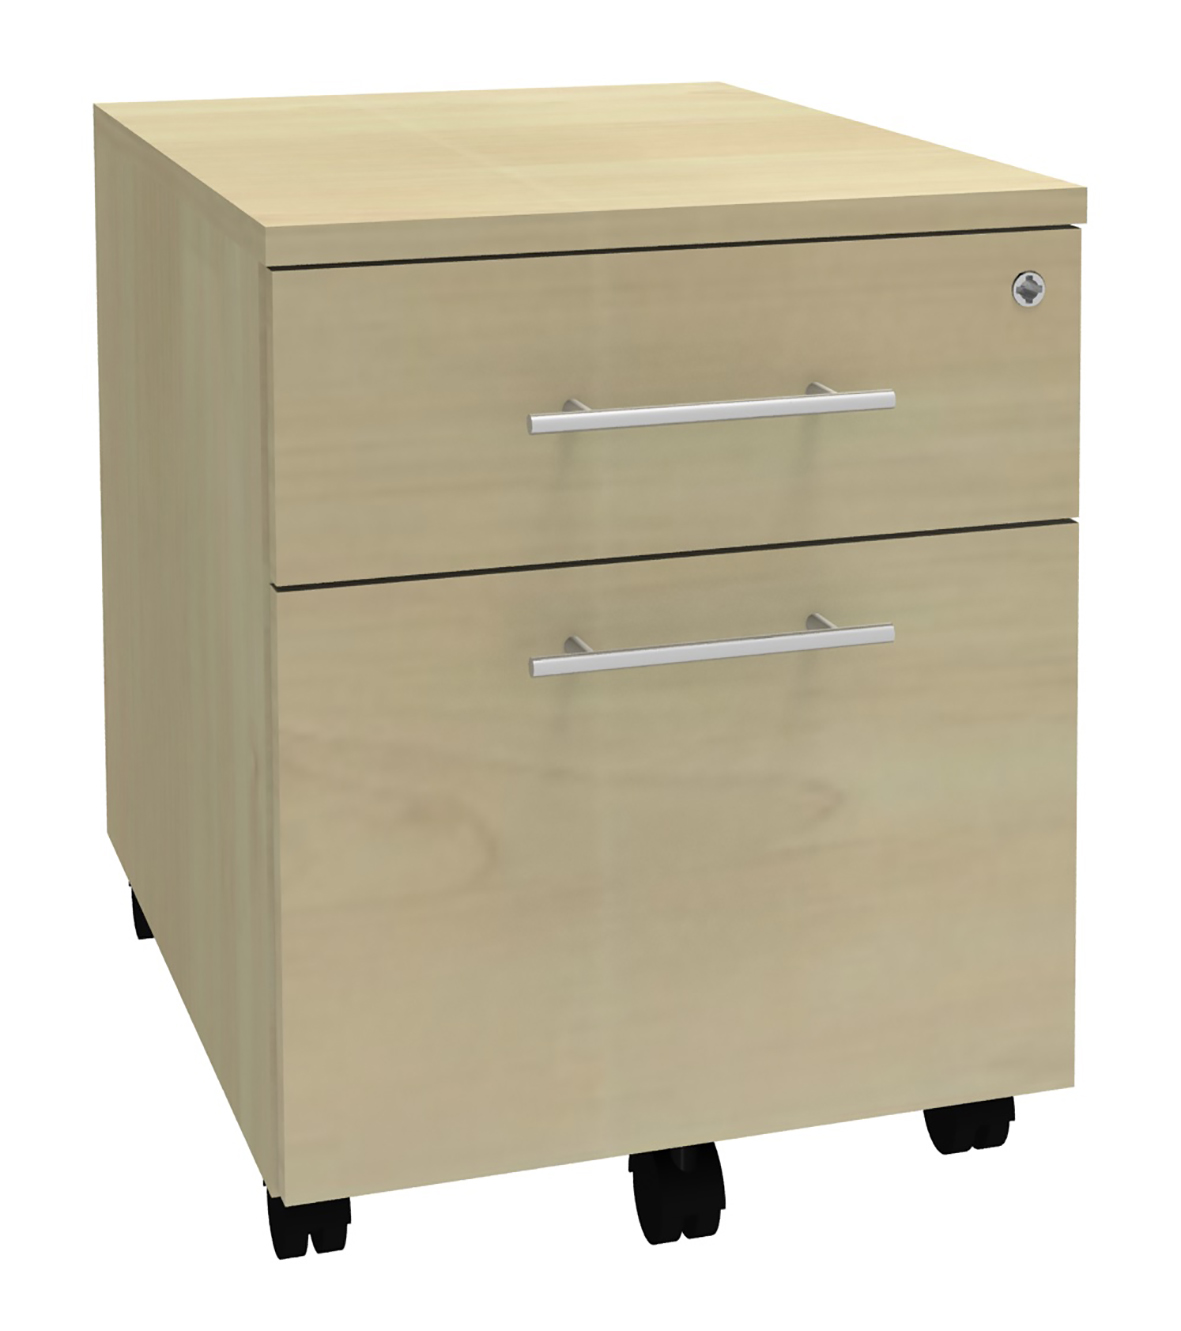 Caisson mobile WOODY / STEELY - L43 x H56 x P60 cm - 2 tiroirs dont 1 DS - Imitation Erable